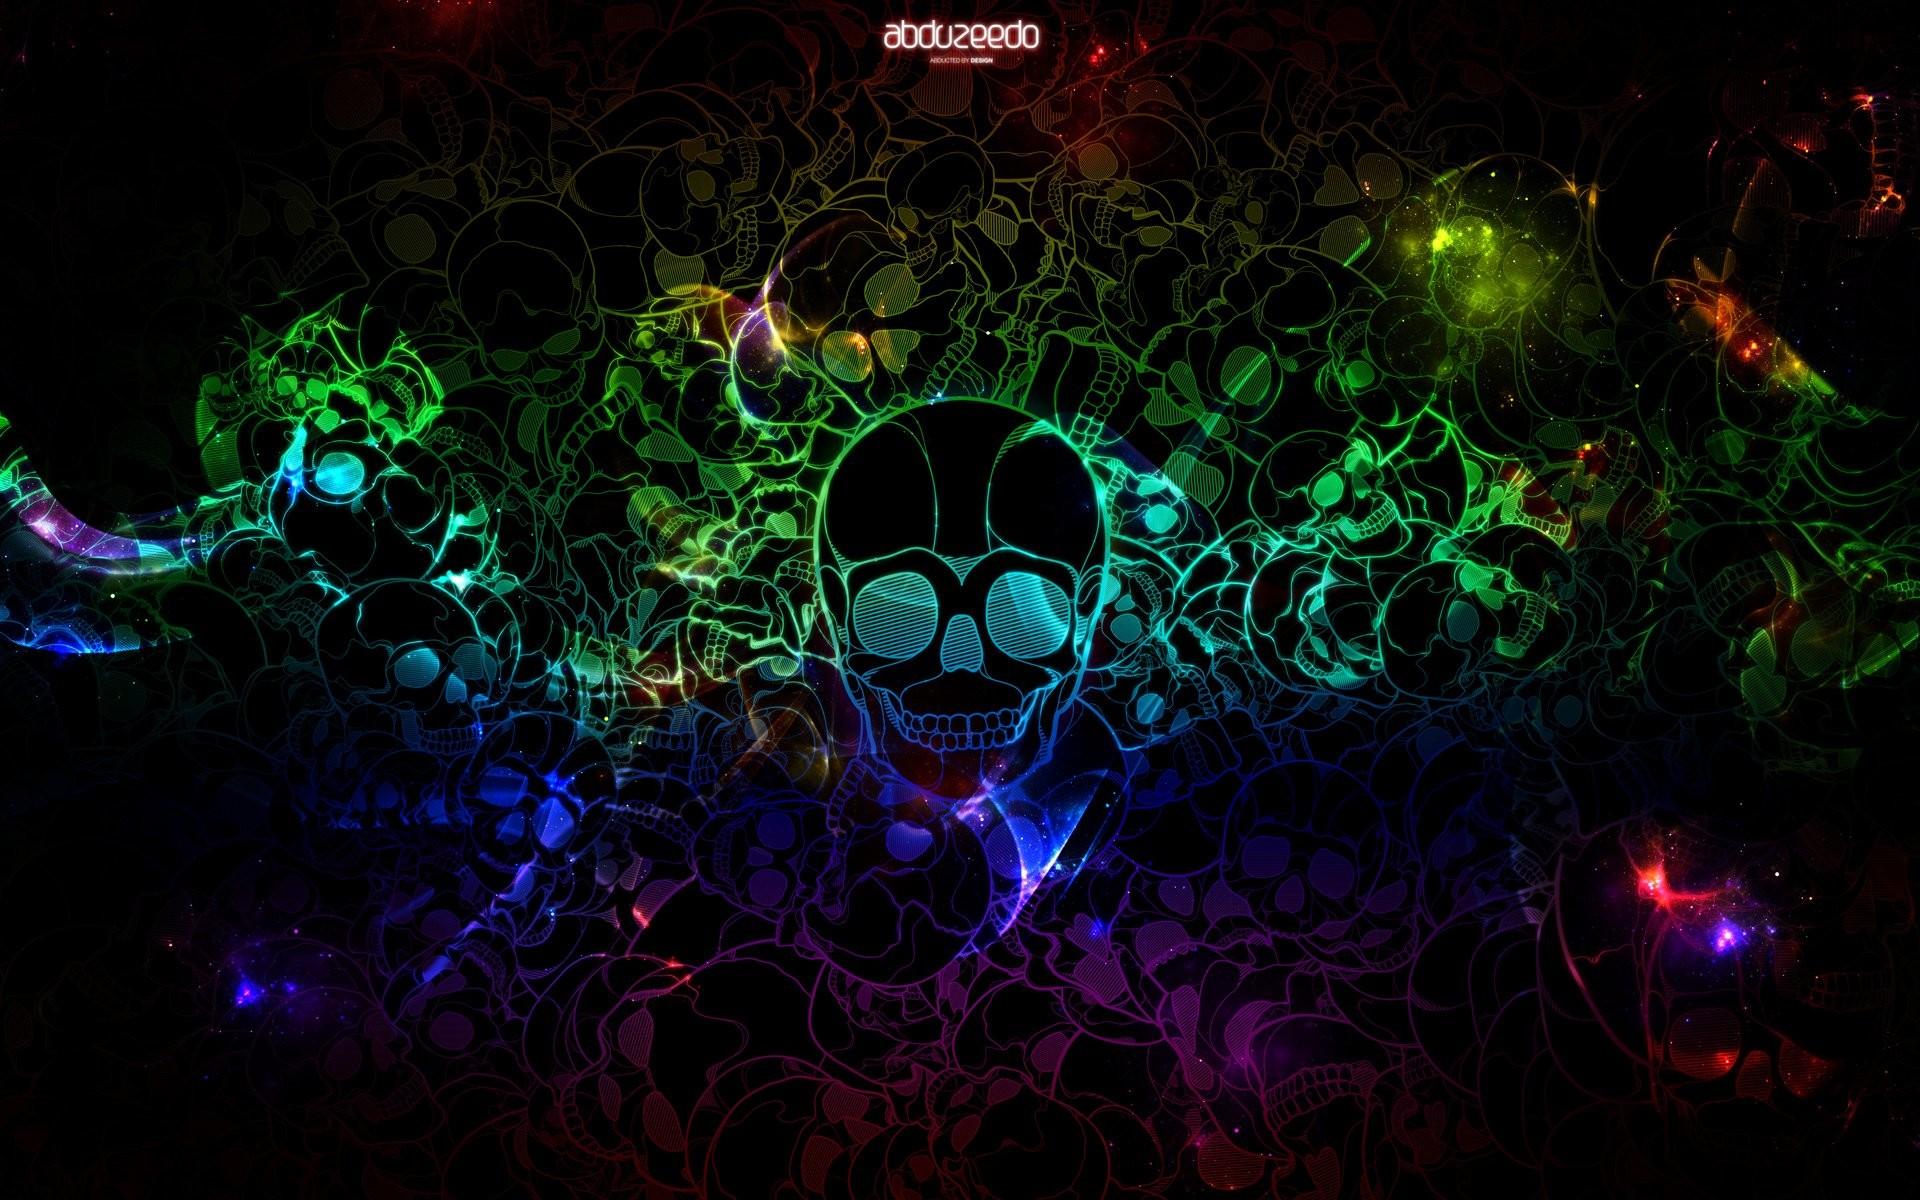 Skull Desktop Wallpaper (55+ images)